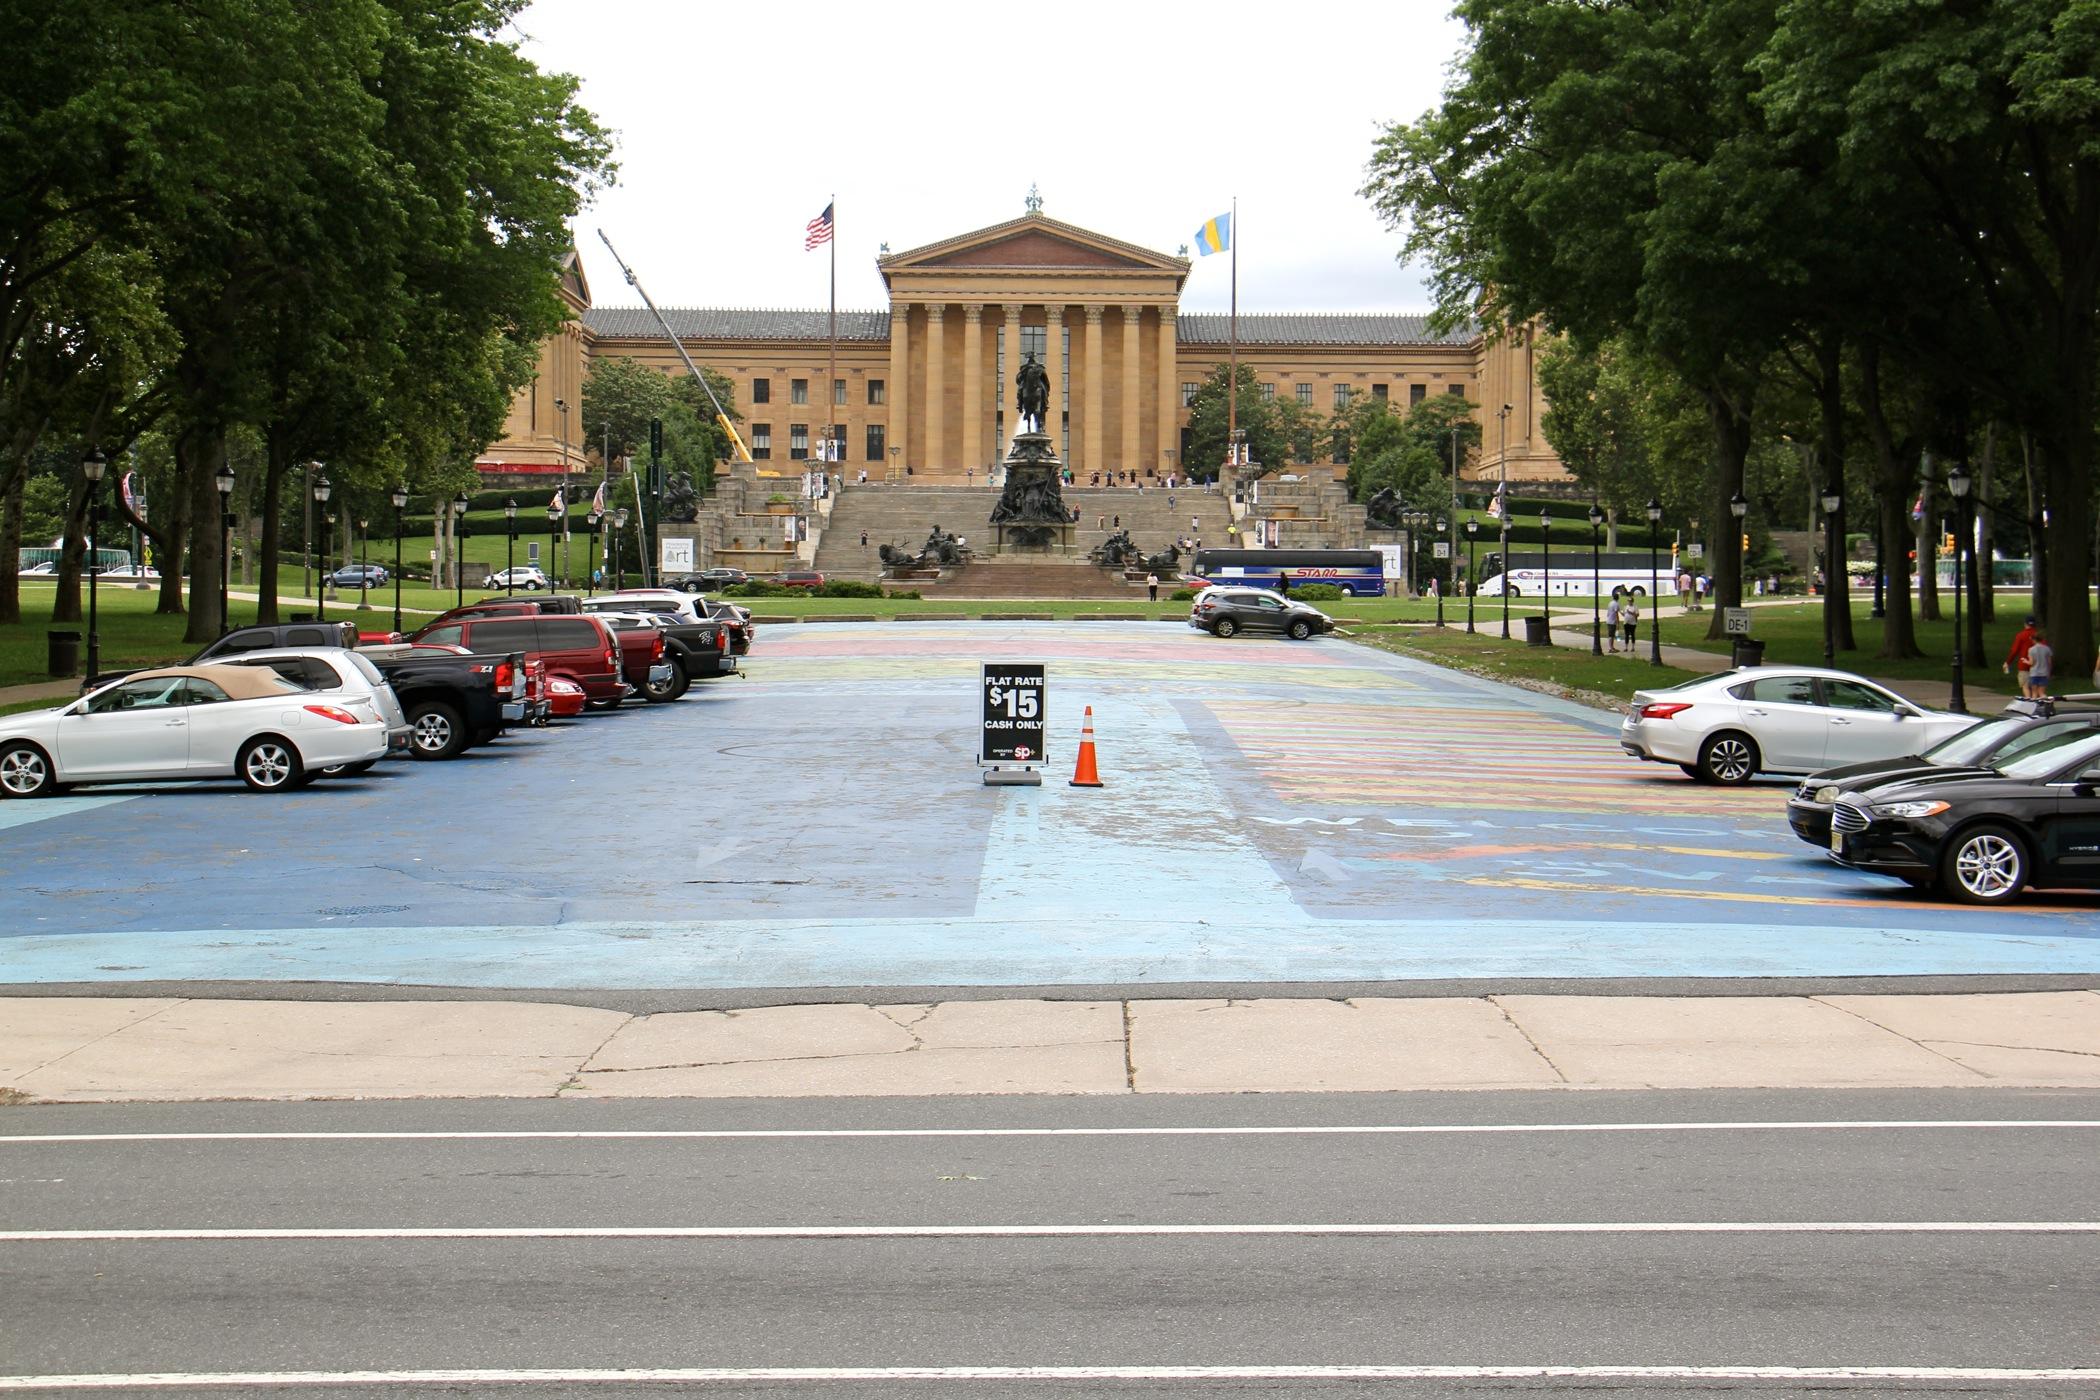 Eakins Oval facing the Philadelphia Museum of Art.